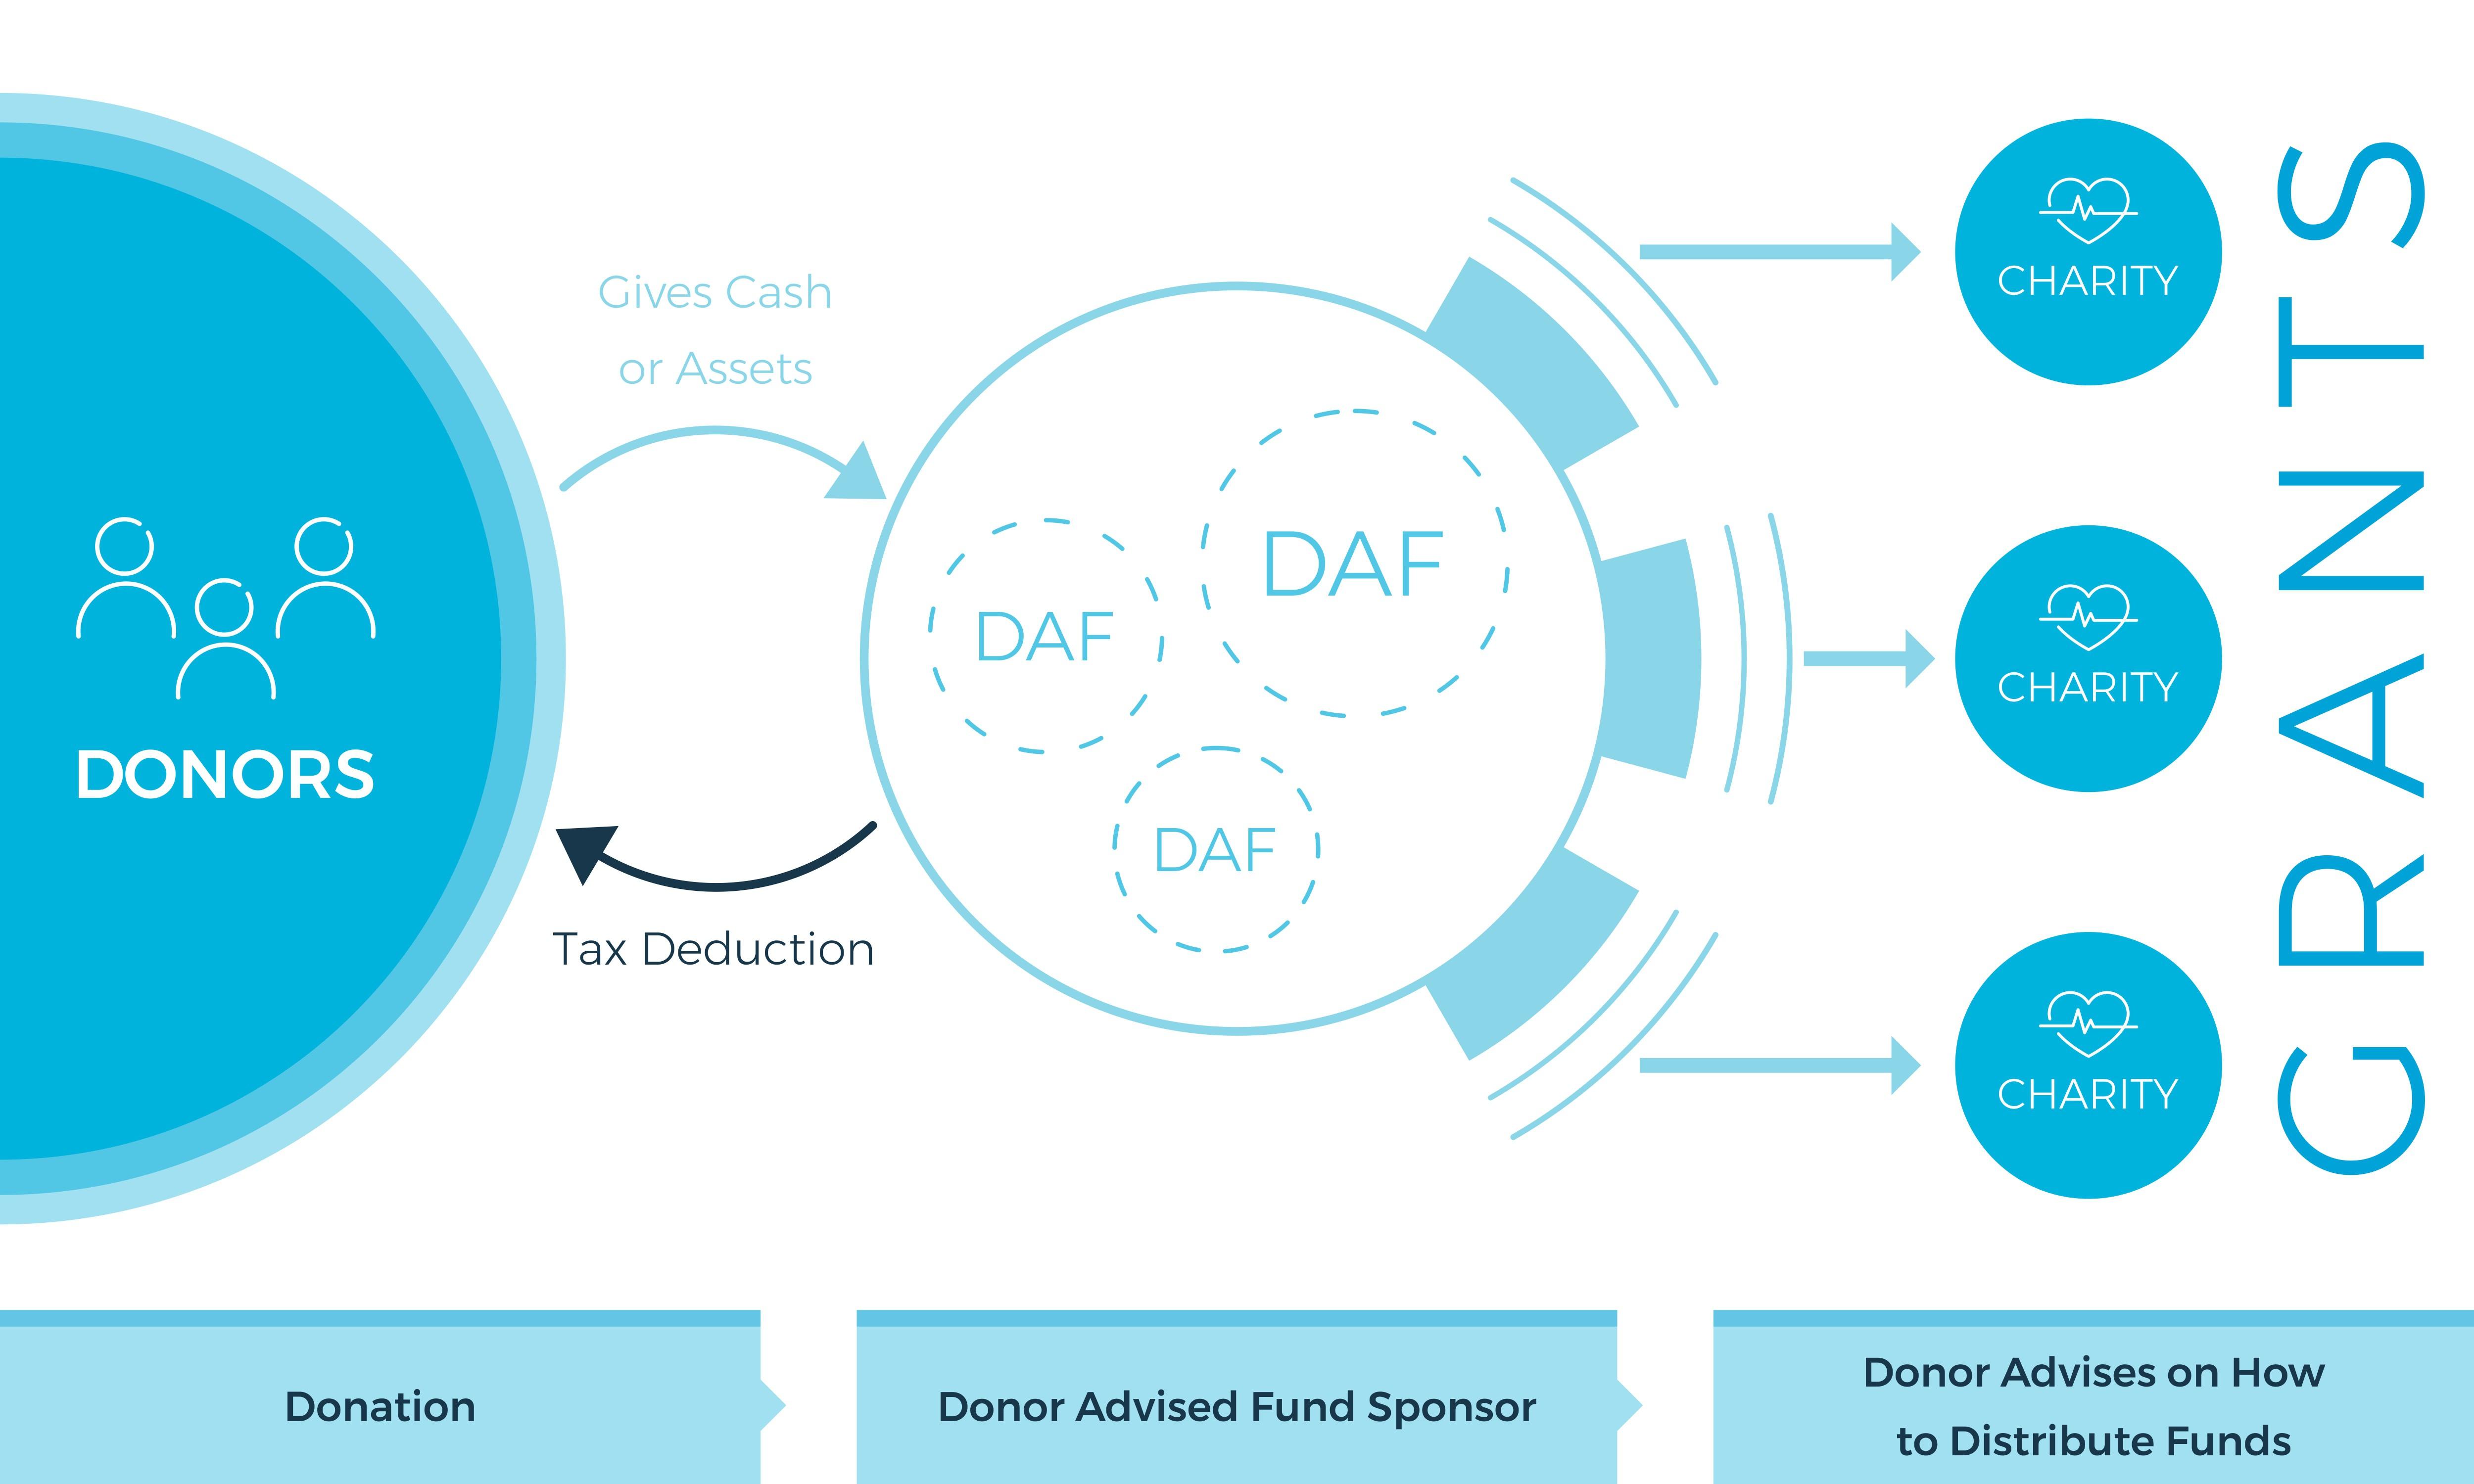 Donor Advised Fund Visual